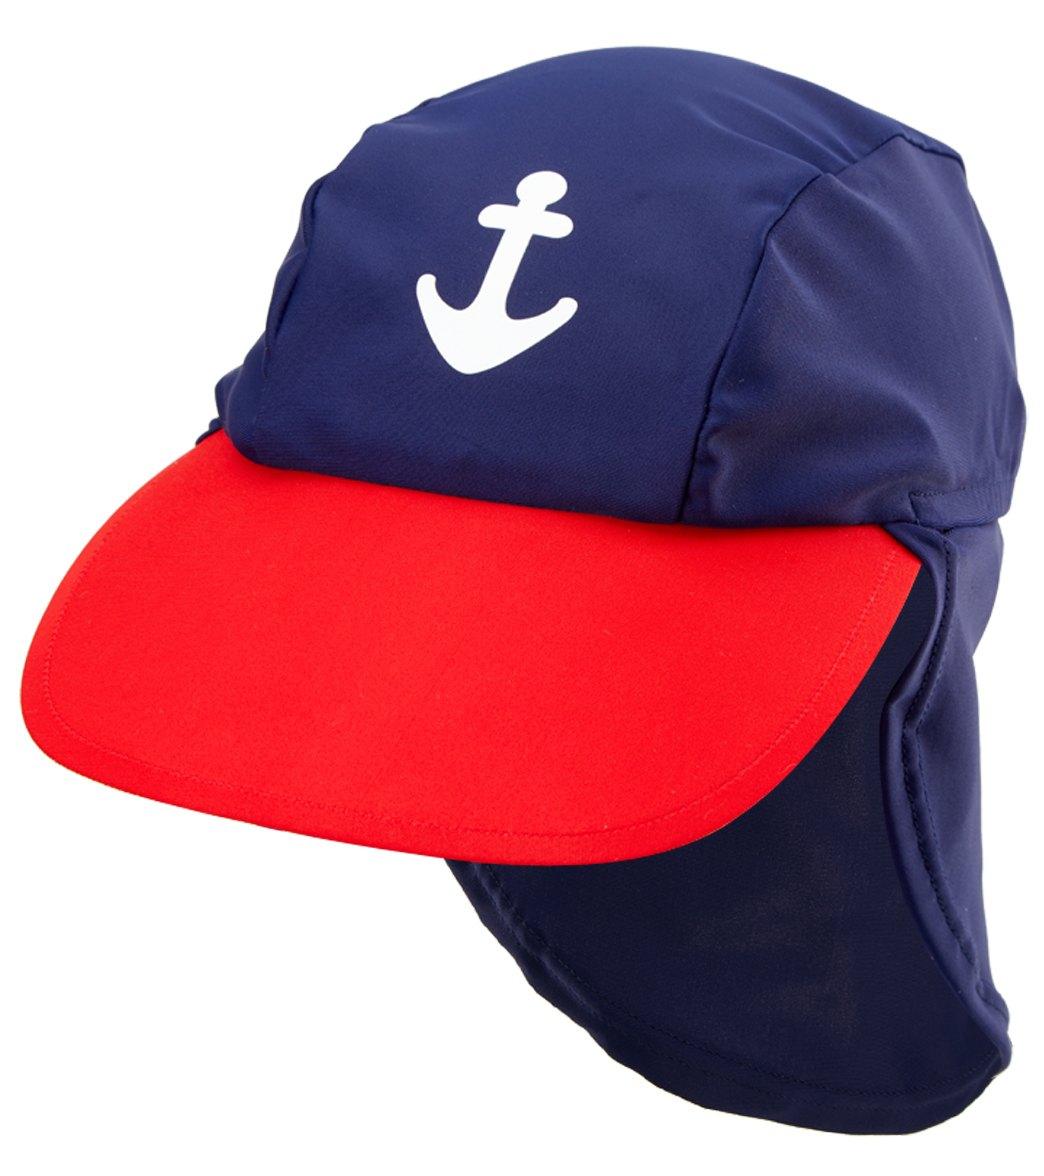 fbd5b219dbdae2 Platypus Australia Boys' Maritime Bucket Hat at SwimOutlet.com